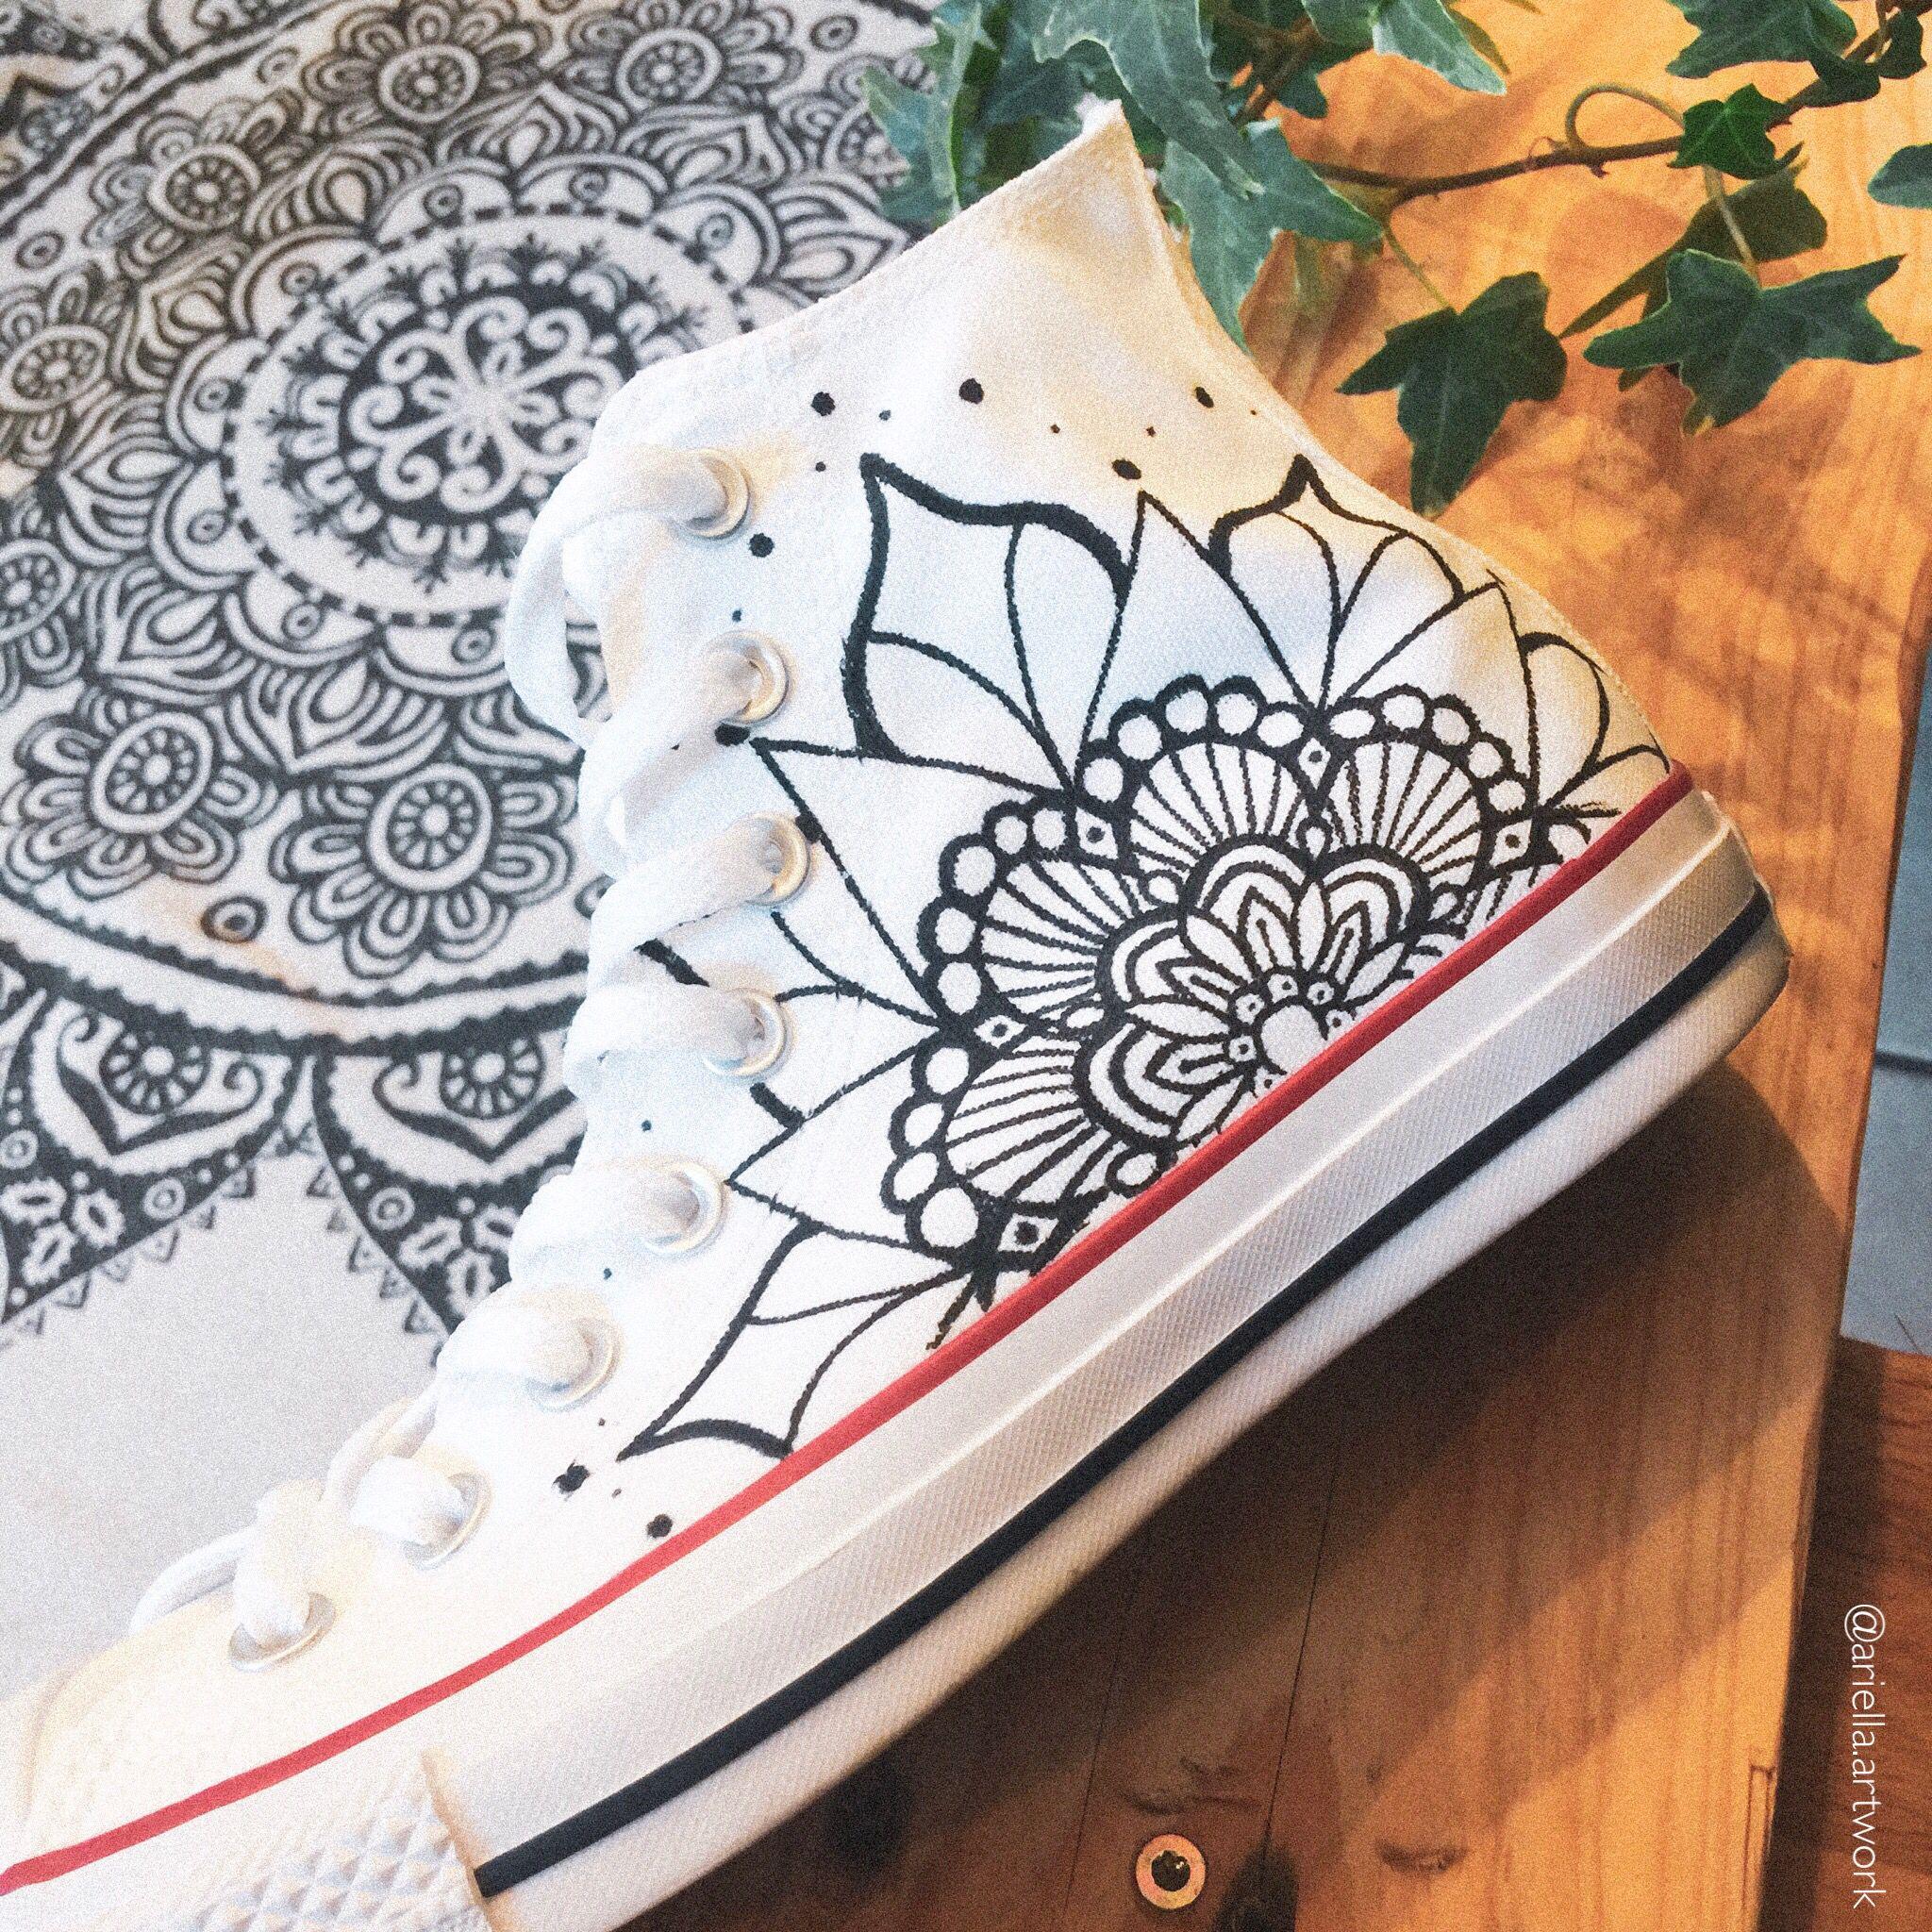 Customized Chucks Mandala Vans Personalizadas Notas De Violao Violao Customizado